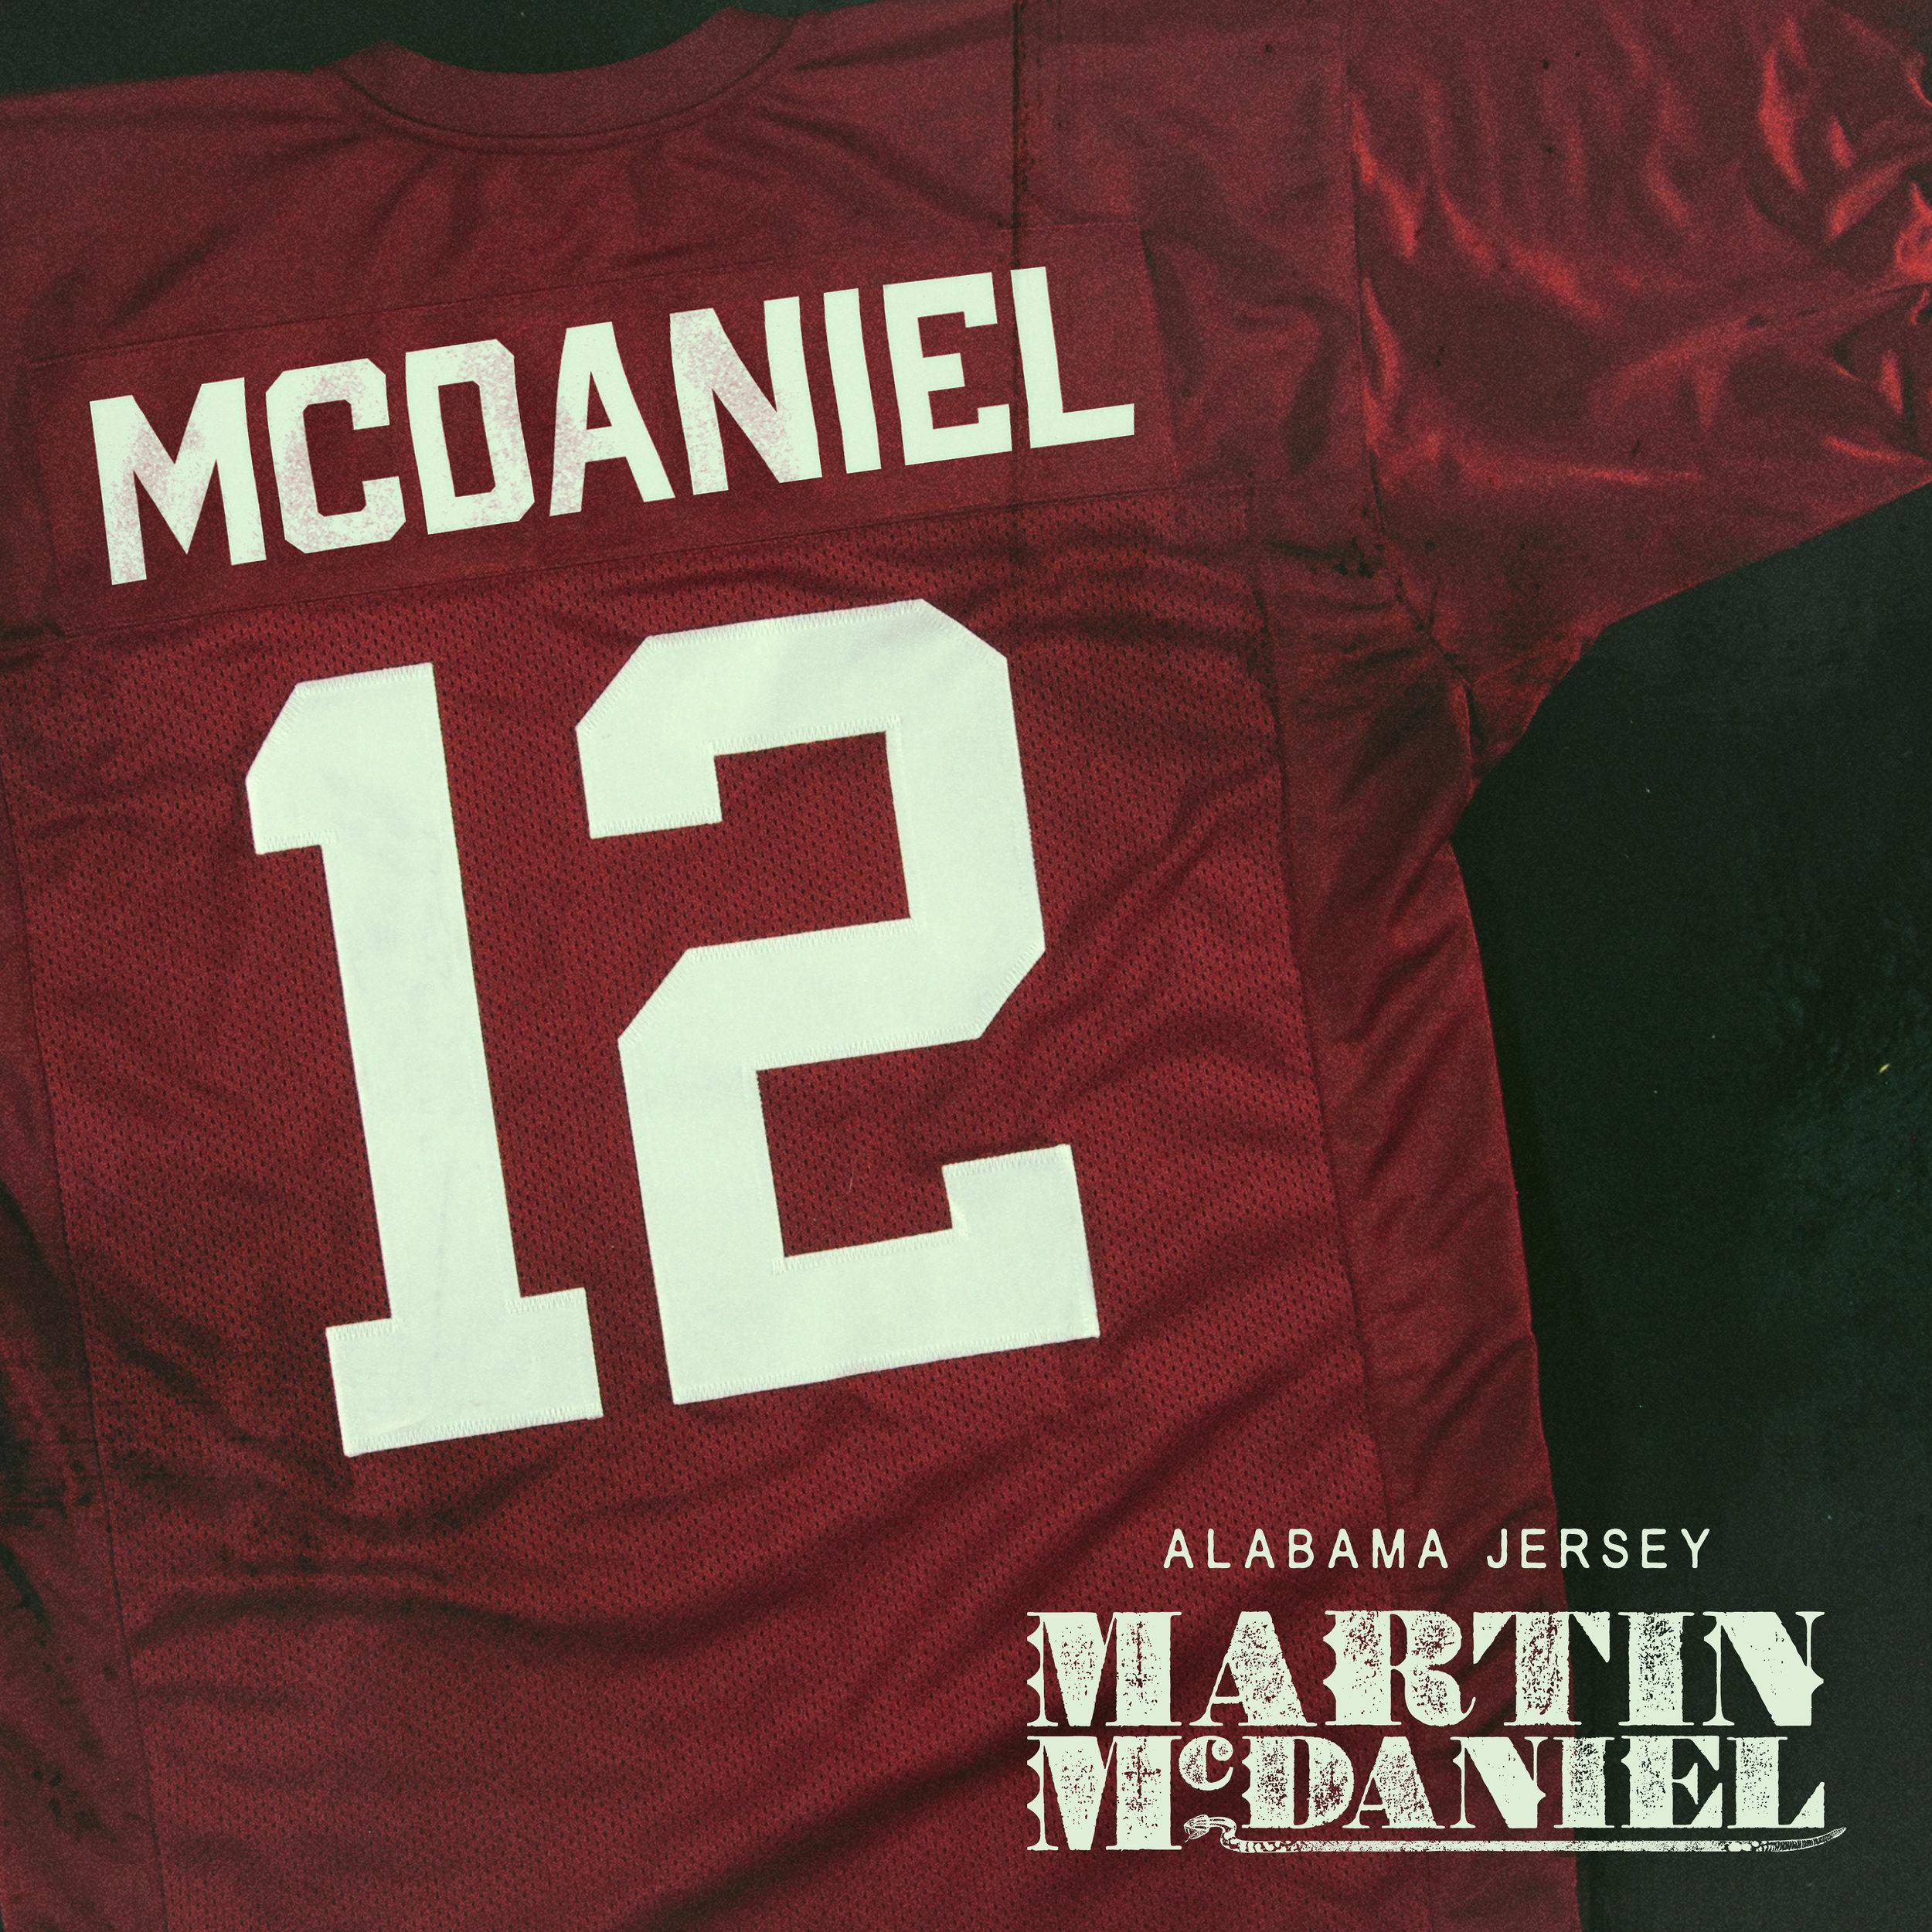 Martin McDaniel -Alabama Jersey - SINGLEReleased October 12, 2018TRACK LISTING01. Alabama Jersey• LISTEN NOW - Spotify | iTunes | YouTube